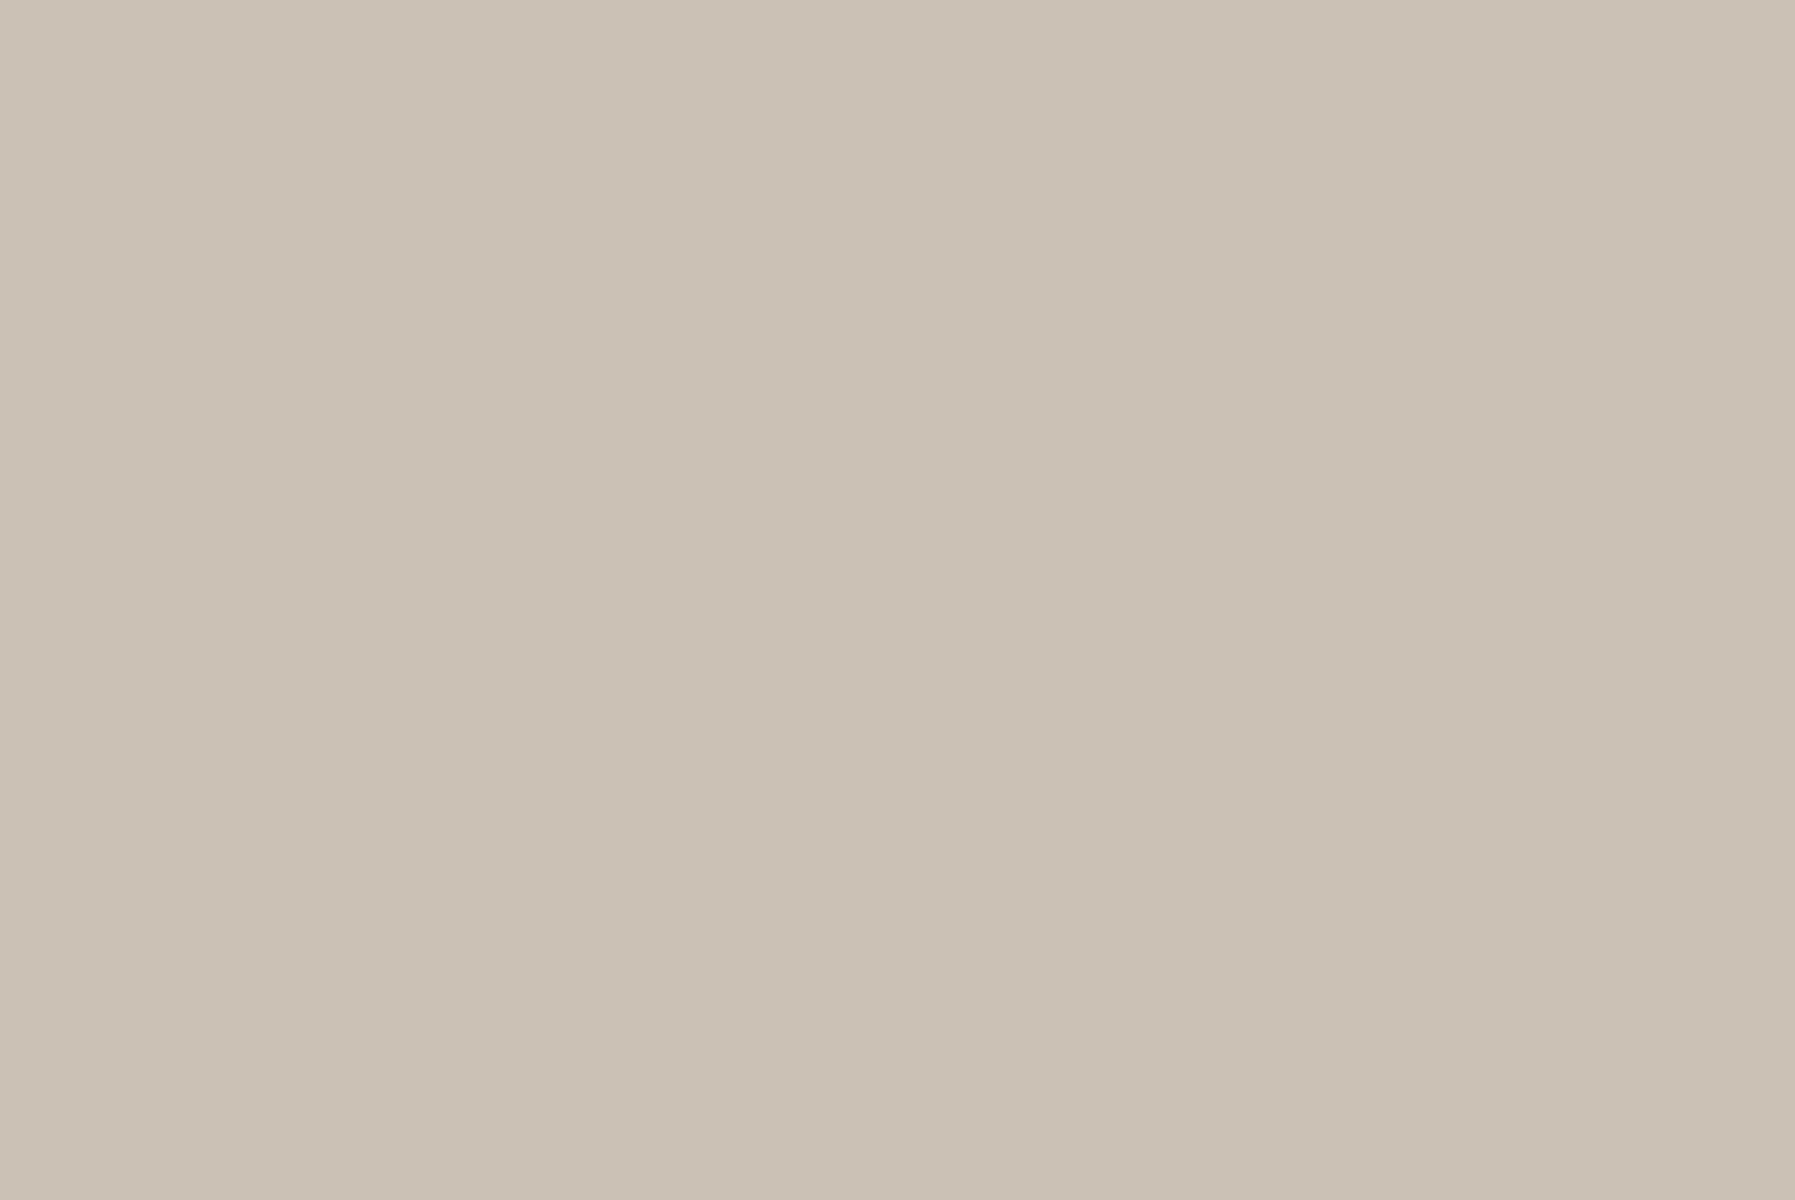 Philips HD9640/00 Avance Collection polpette ottenute